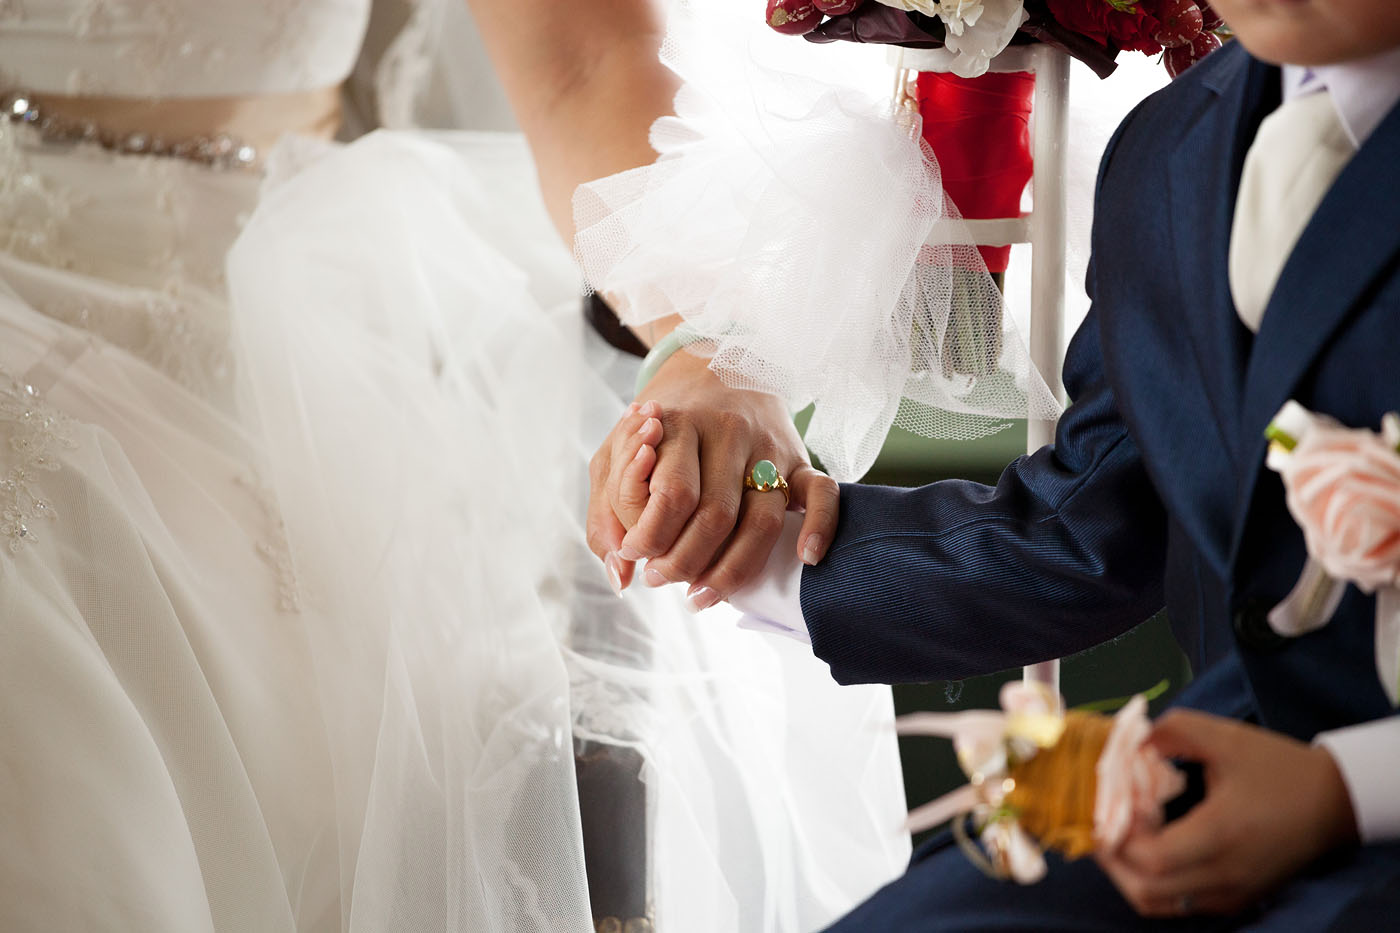 bruiloft-wedding-trouwen-fotograaf-chinees-bobhersbach-rotterdam-feest-dansen-holdinghands